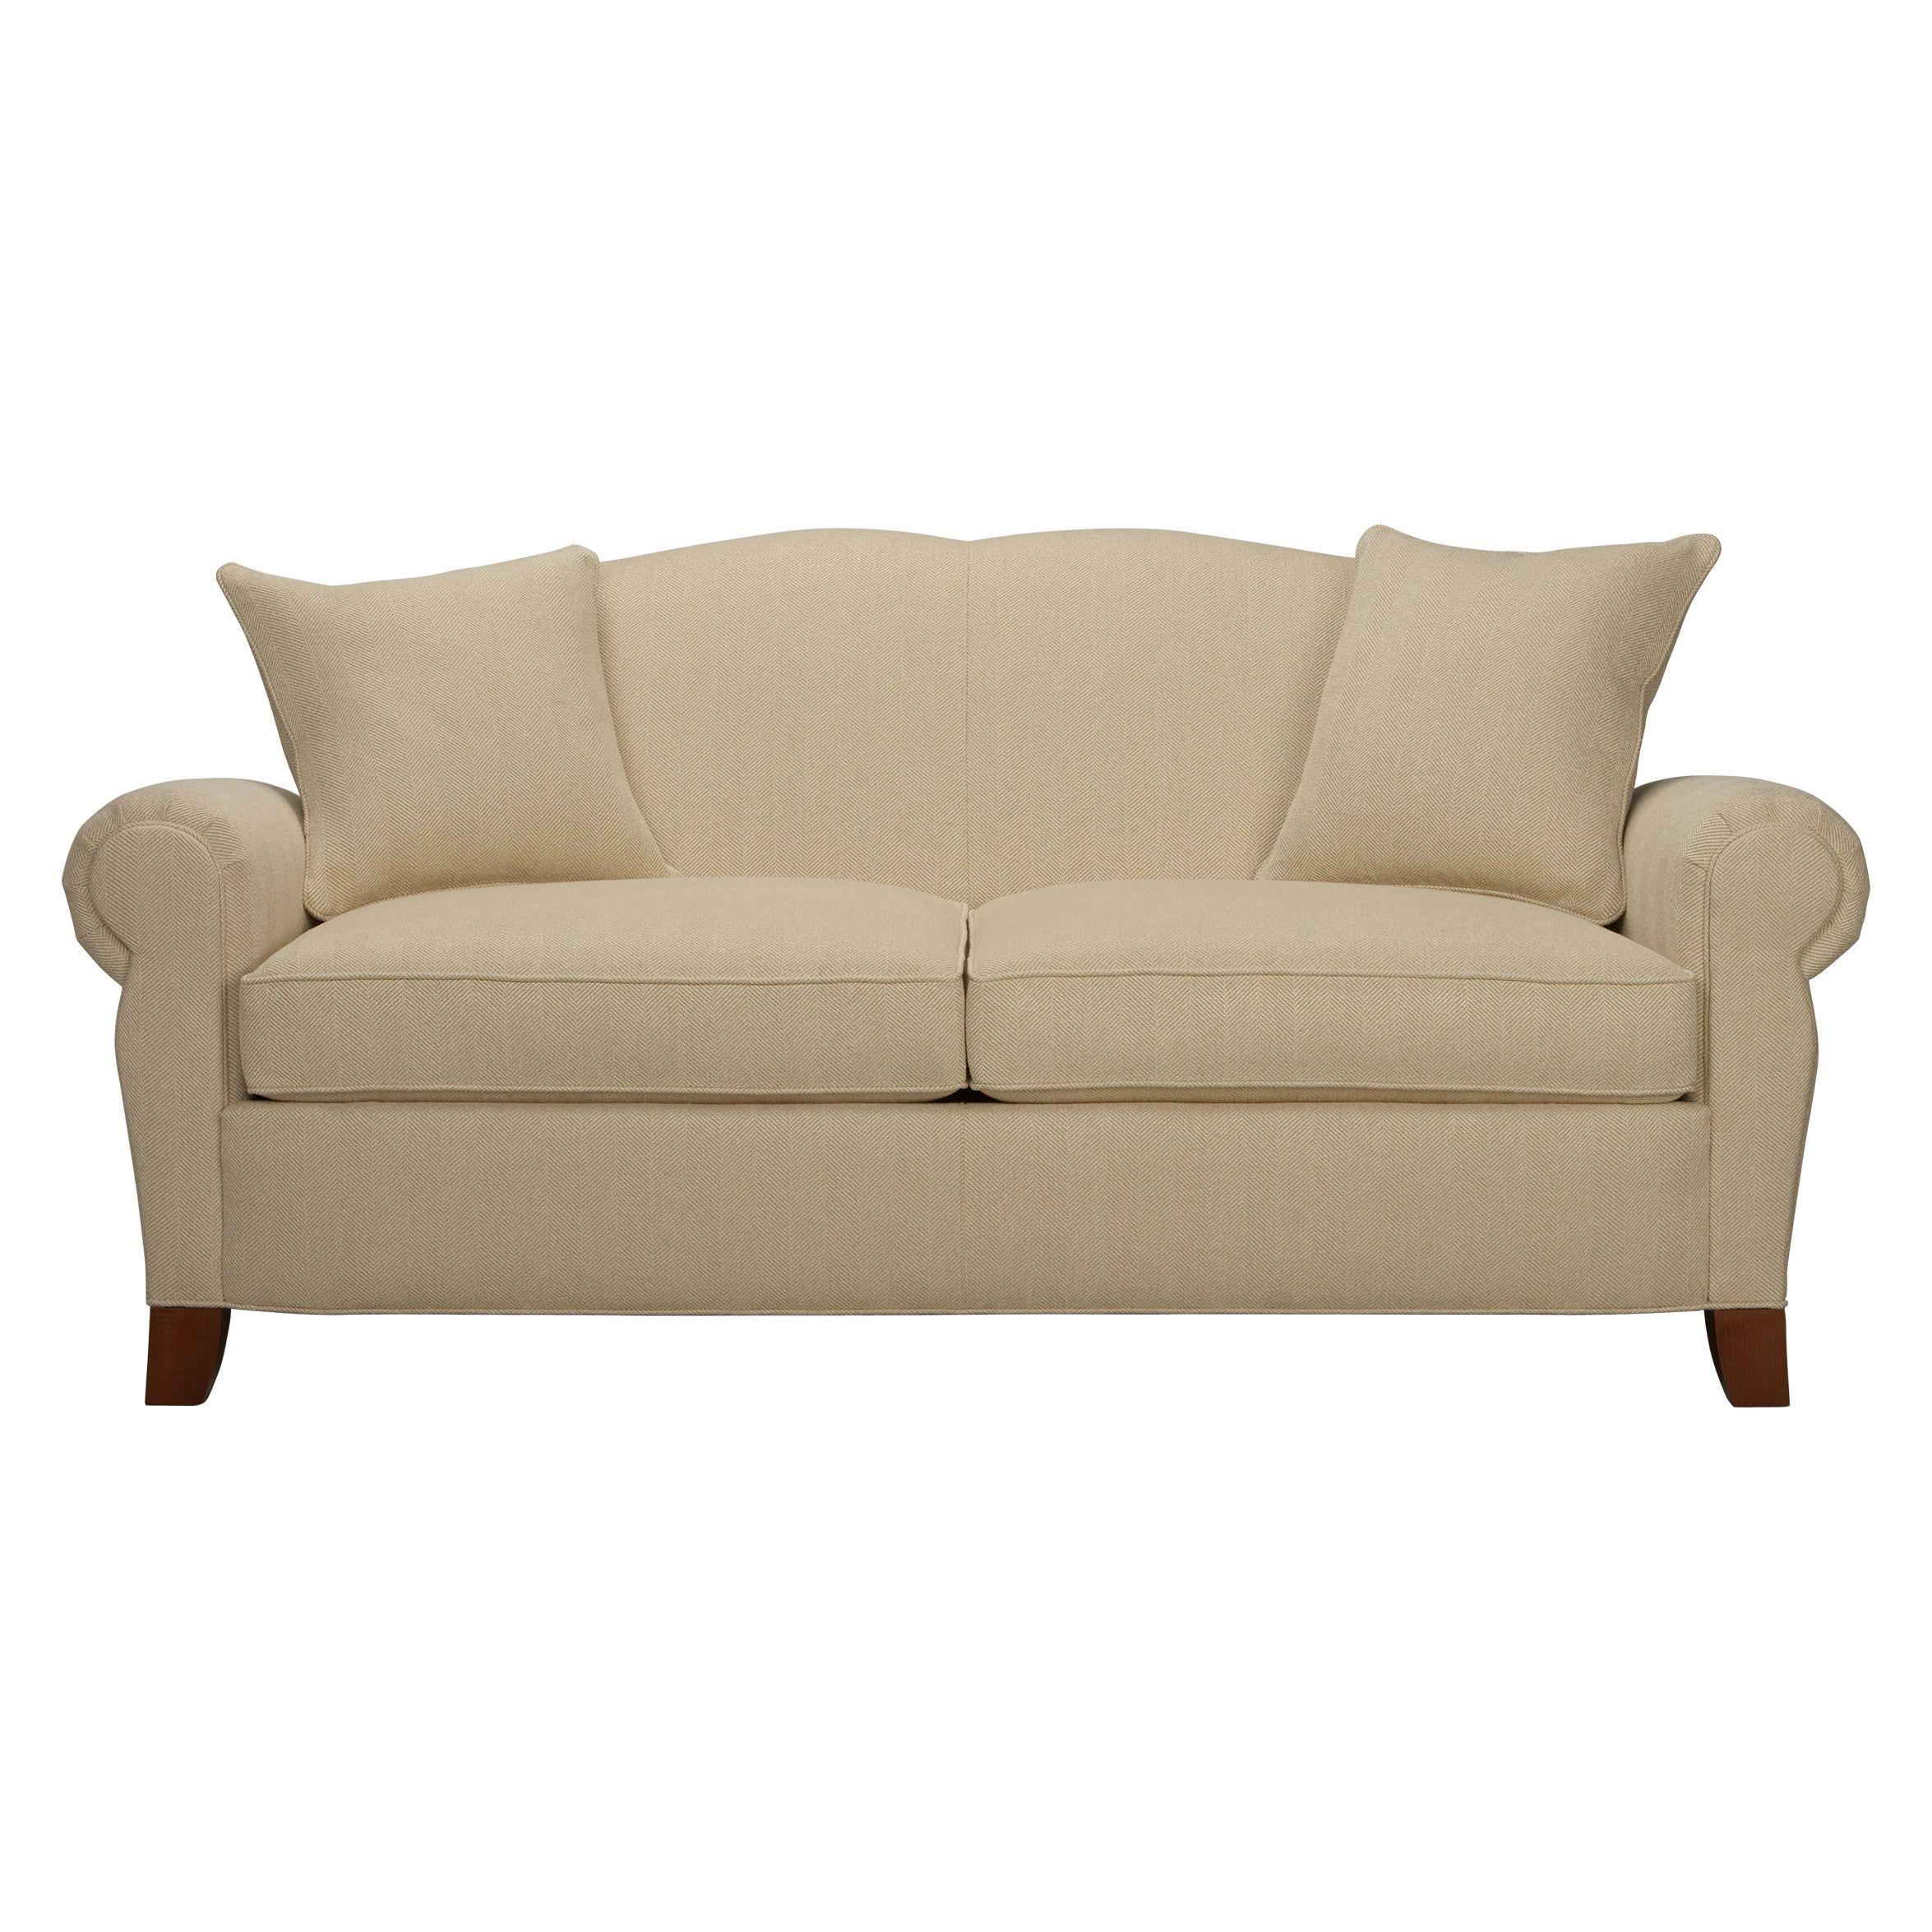 Paloma Two Cushion Sofa Ethan Allen Us Home Pinterest Sofas And Ethan Allen